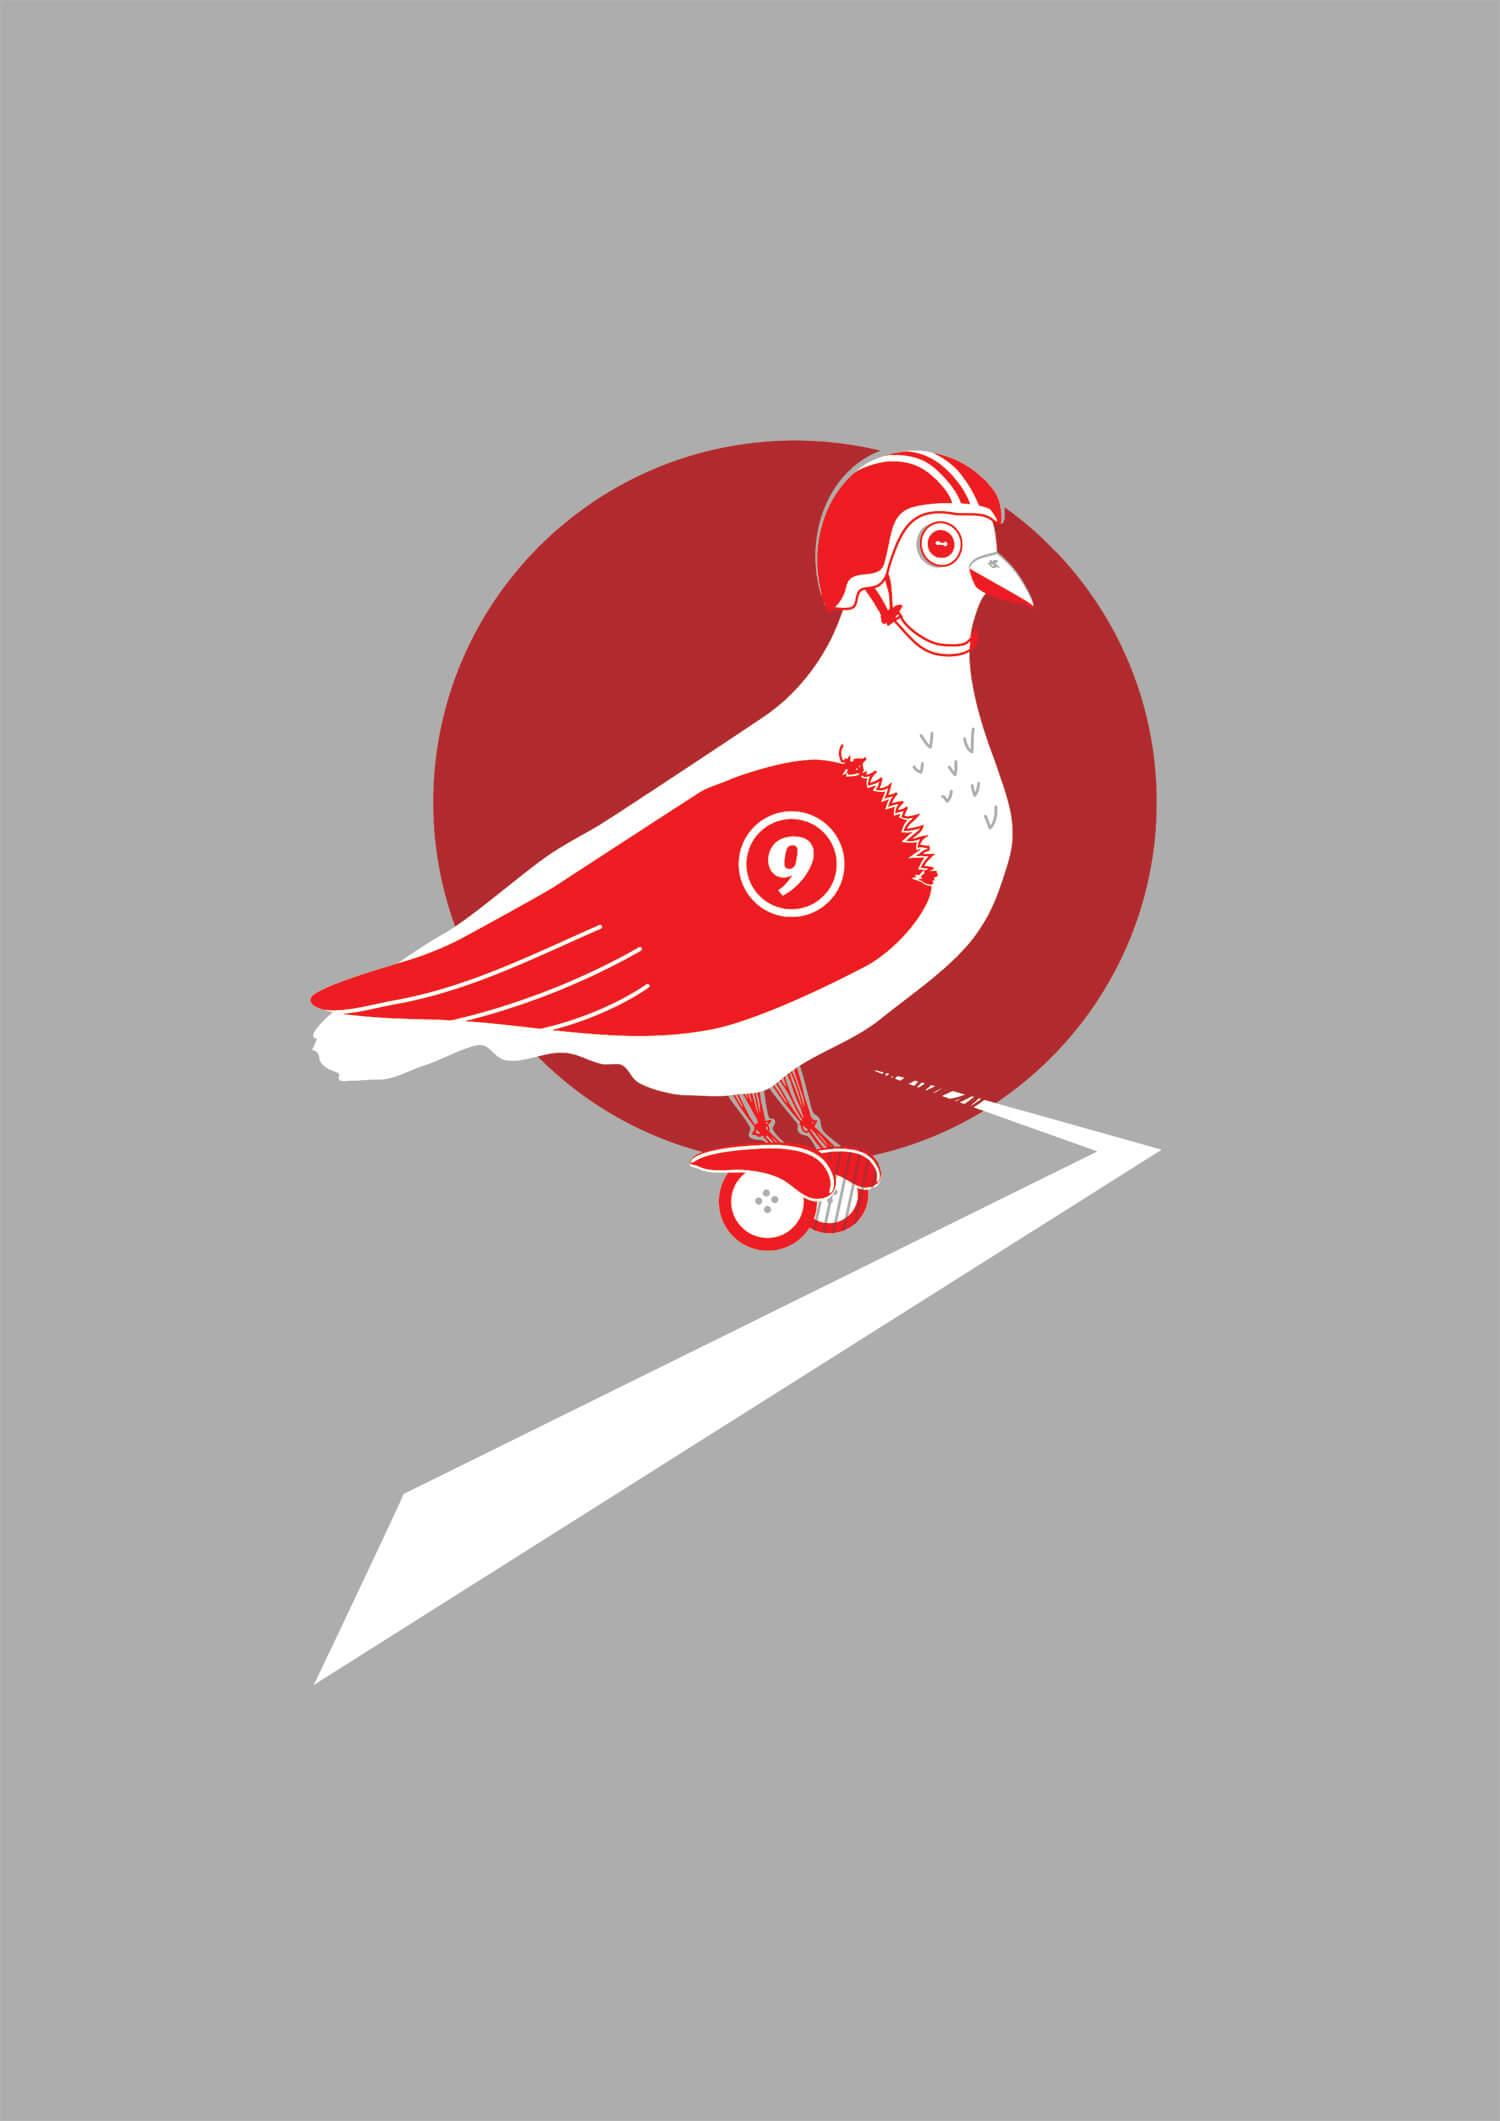 Racing Pigeon No 9